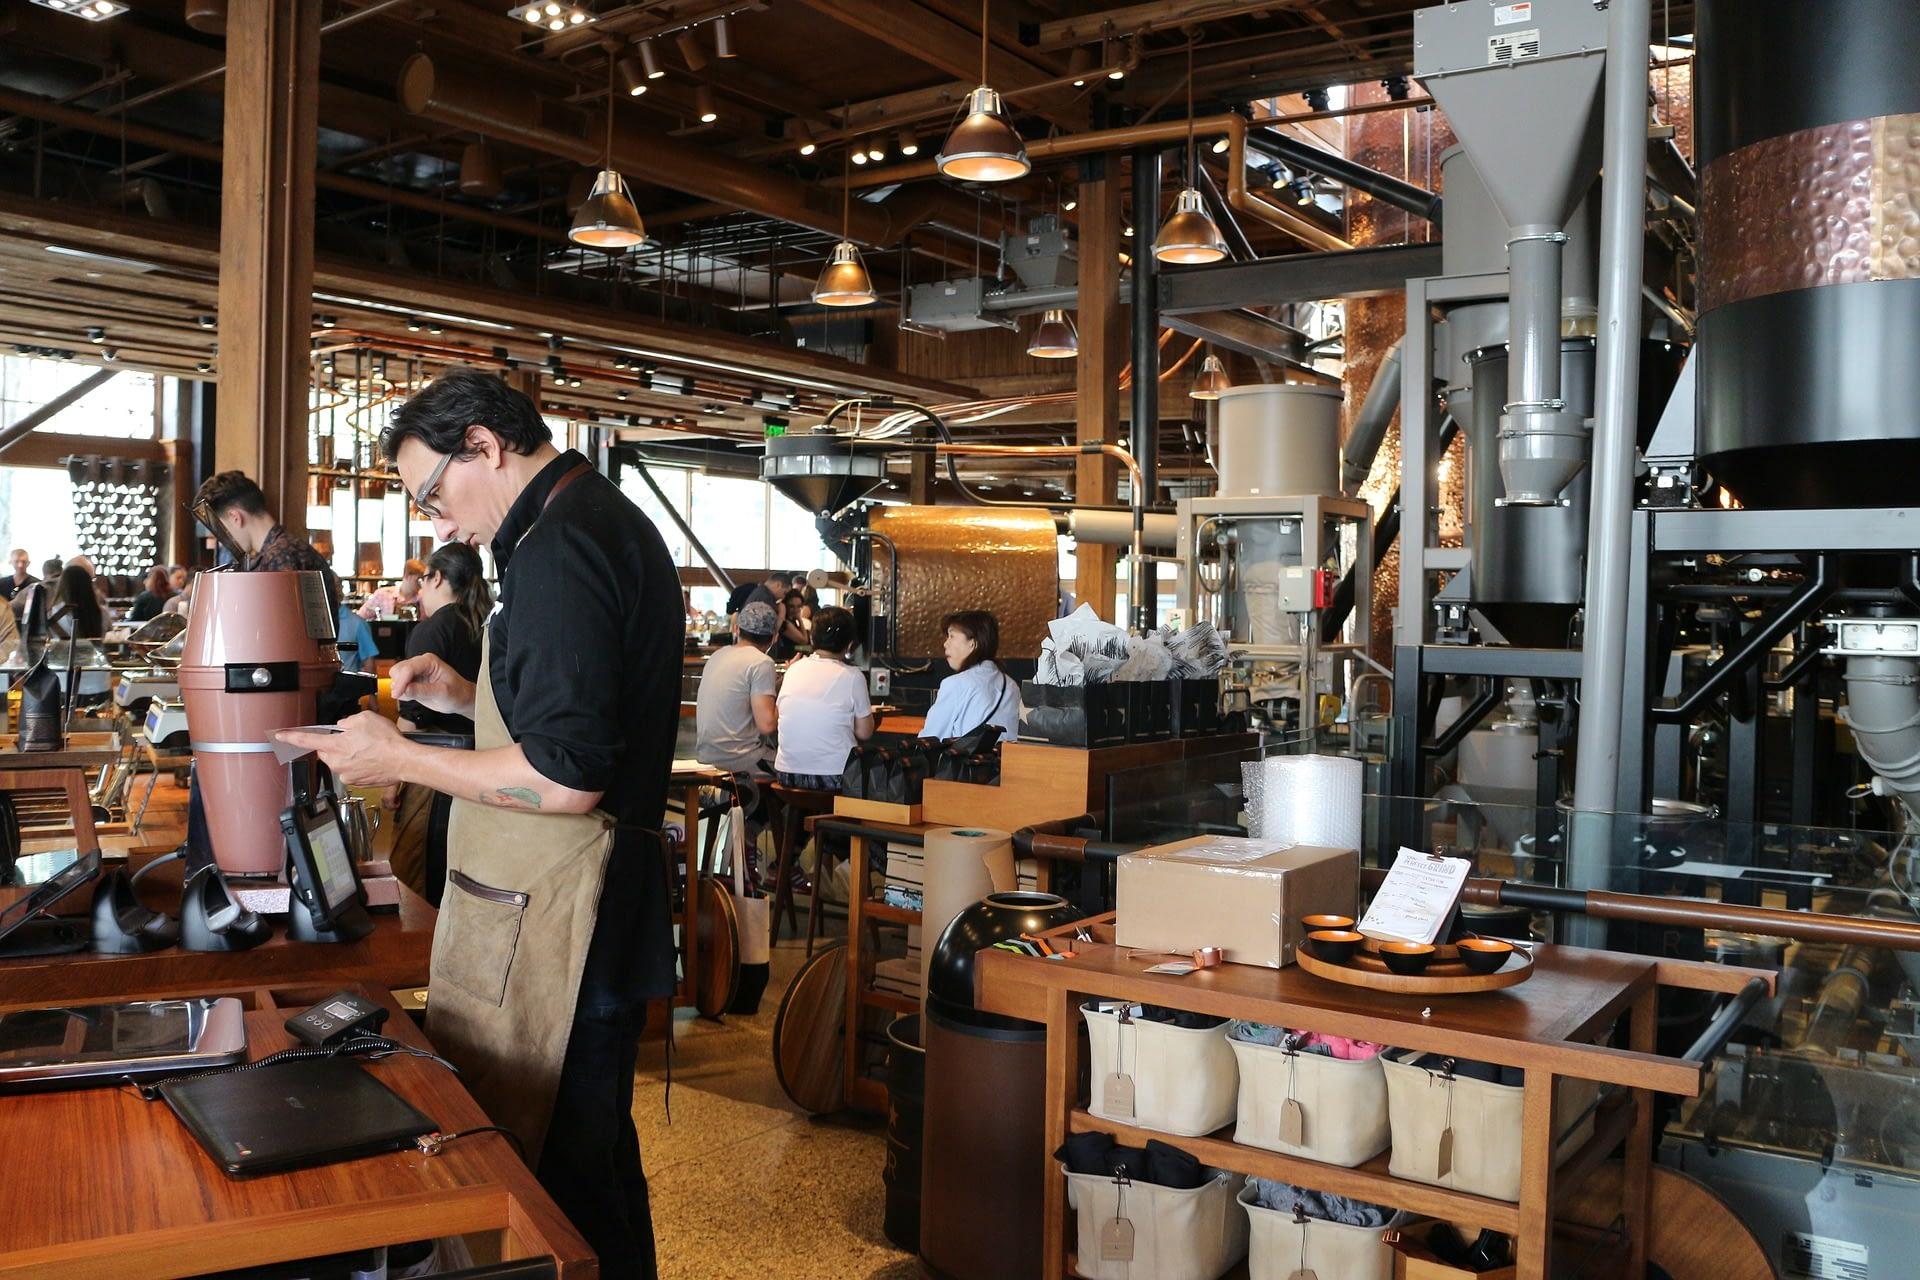 A Starbucks coffee house